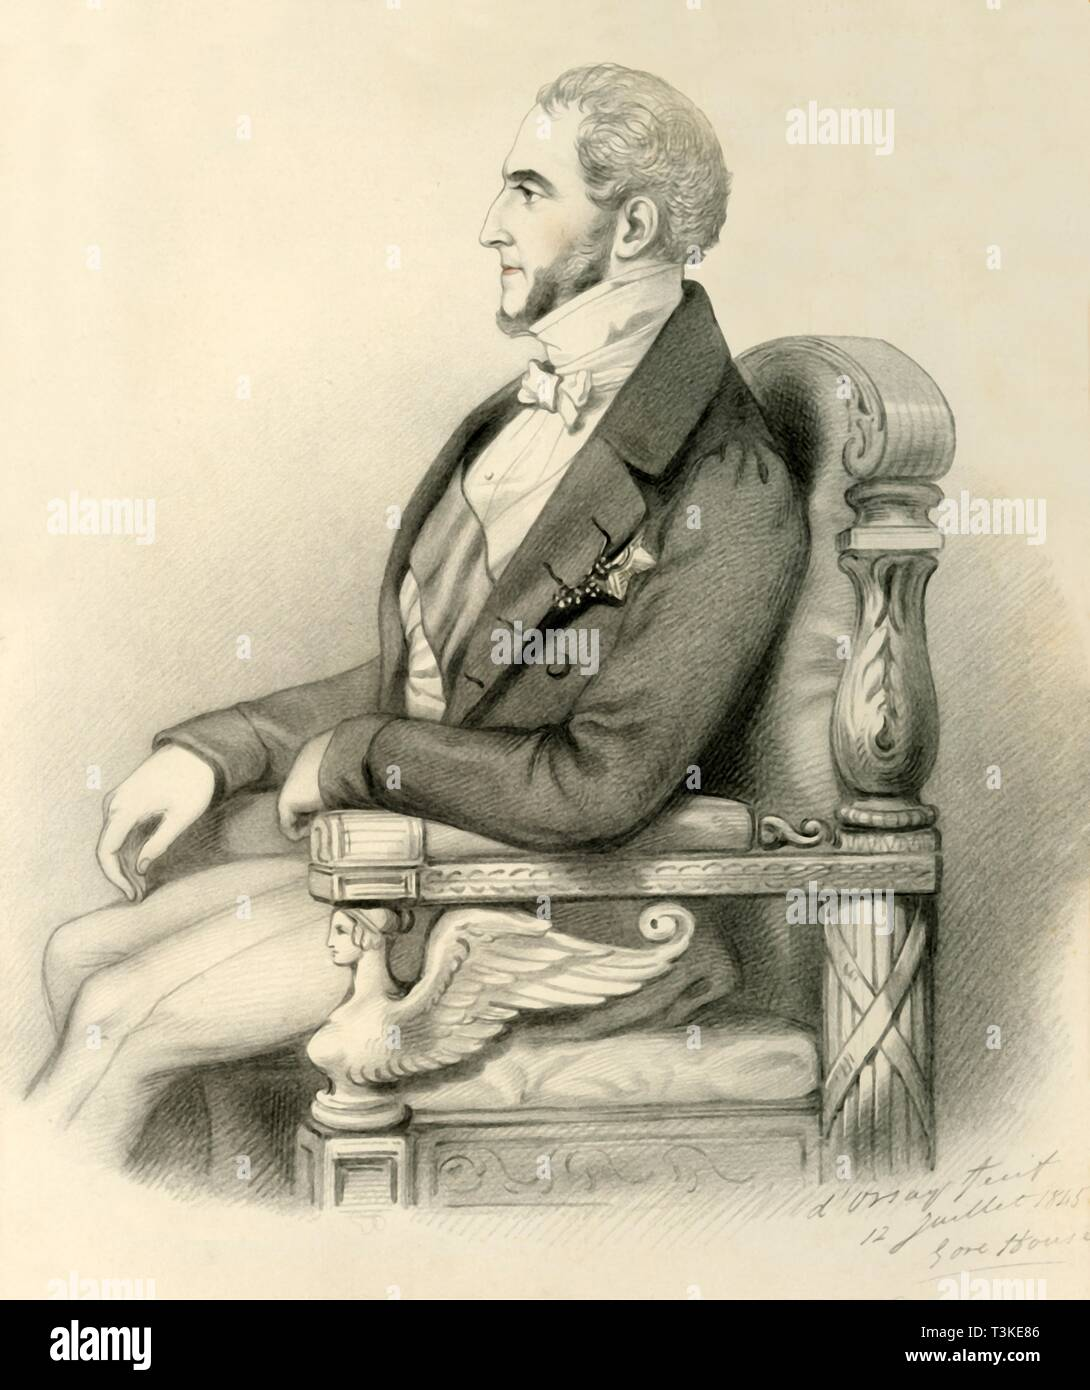 'Le Duc de Gramont', 1845. Creator: Alfred d'Orsay. - Stock Image